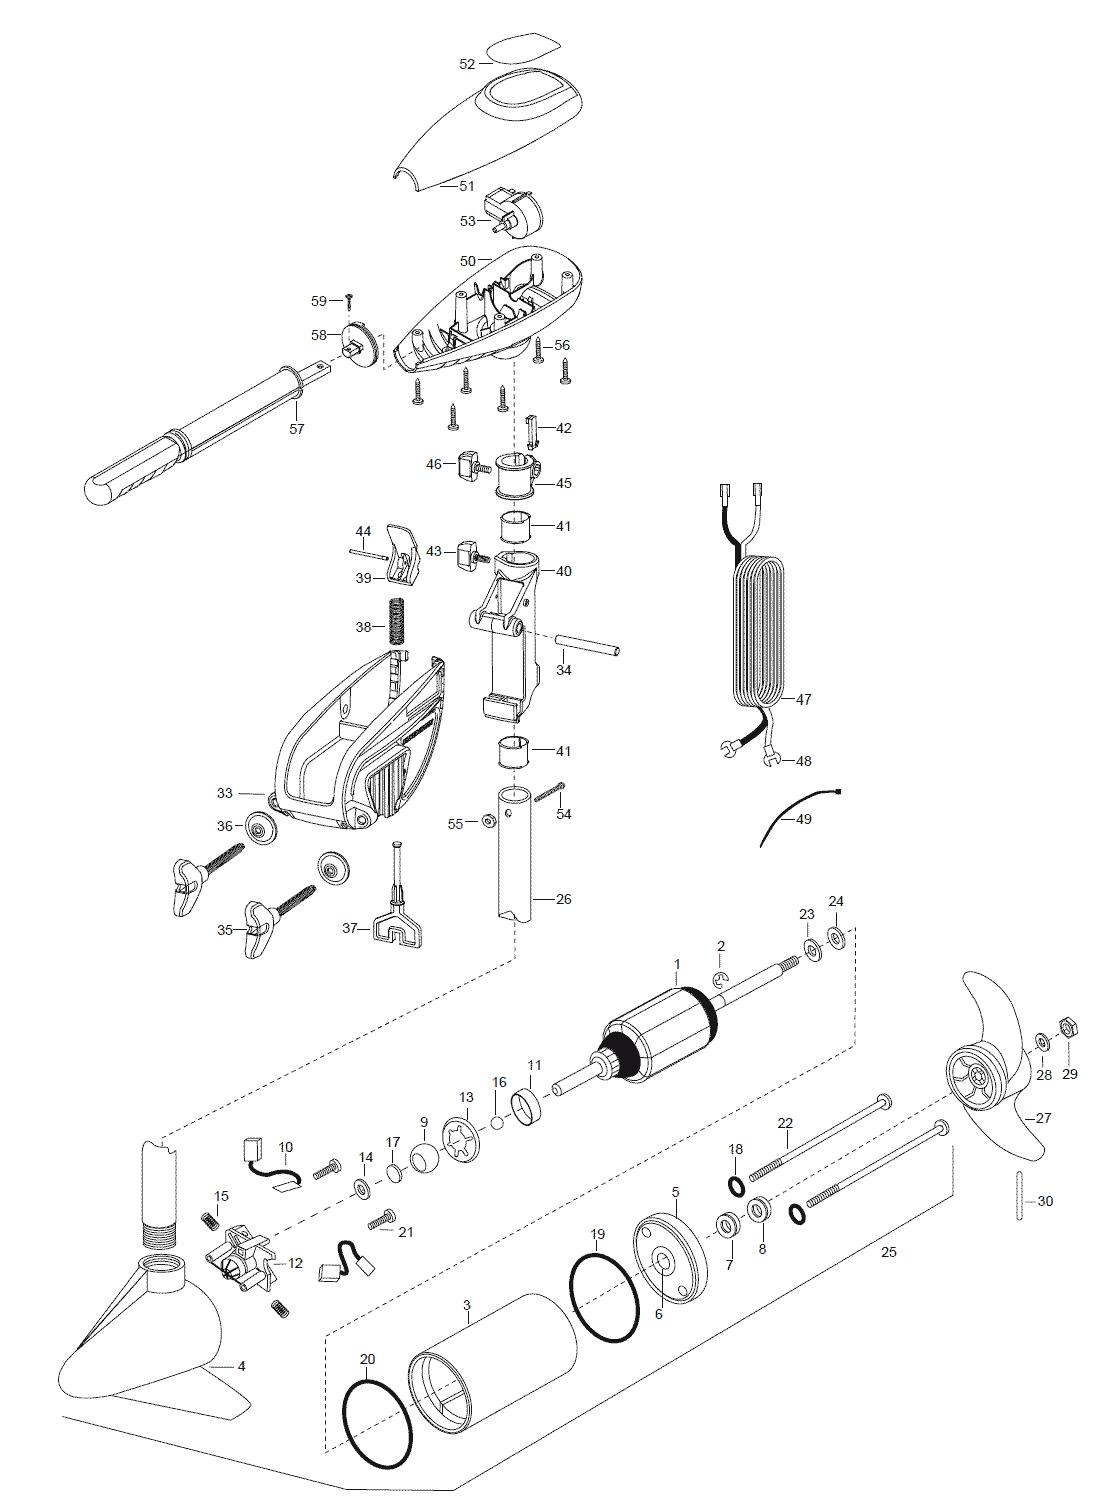 Minn Kota Endura 40 Parts